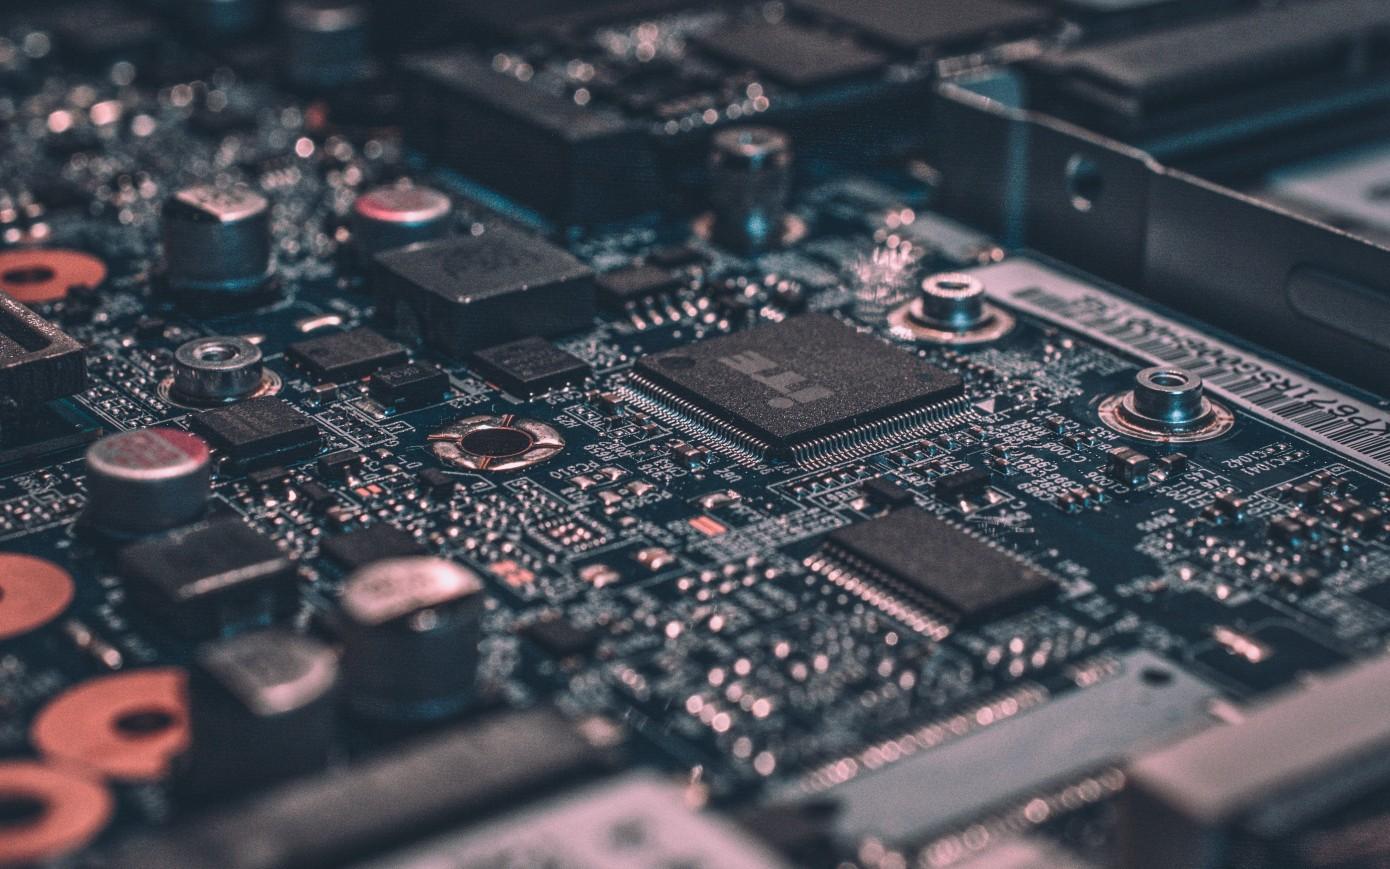 Sending IoT Data From Arduino to Questdb